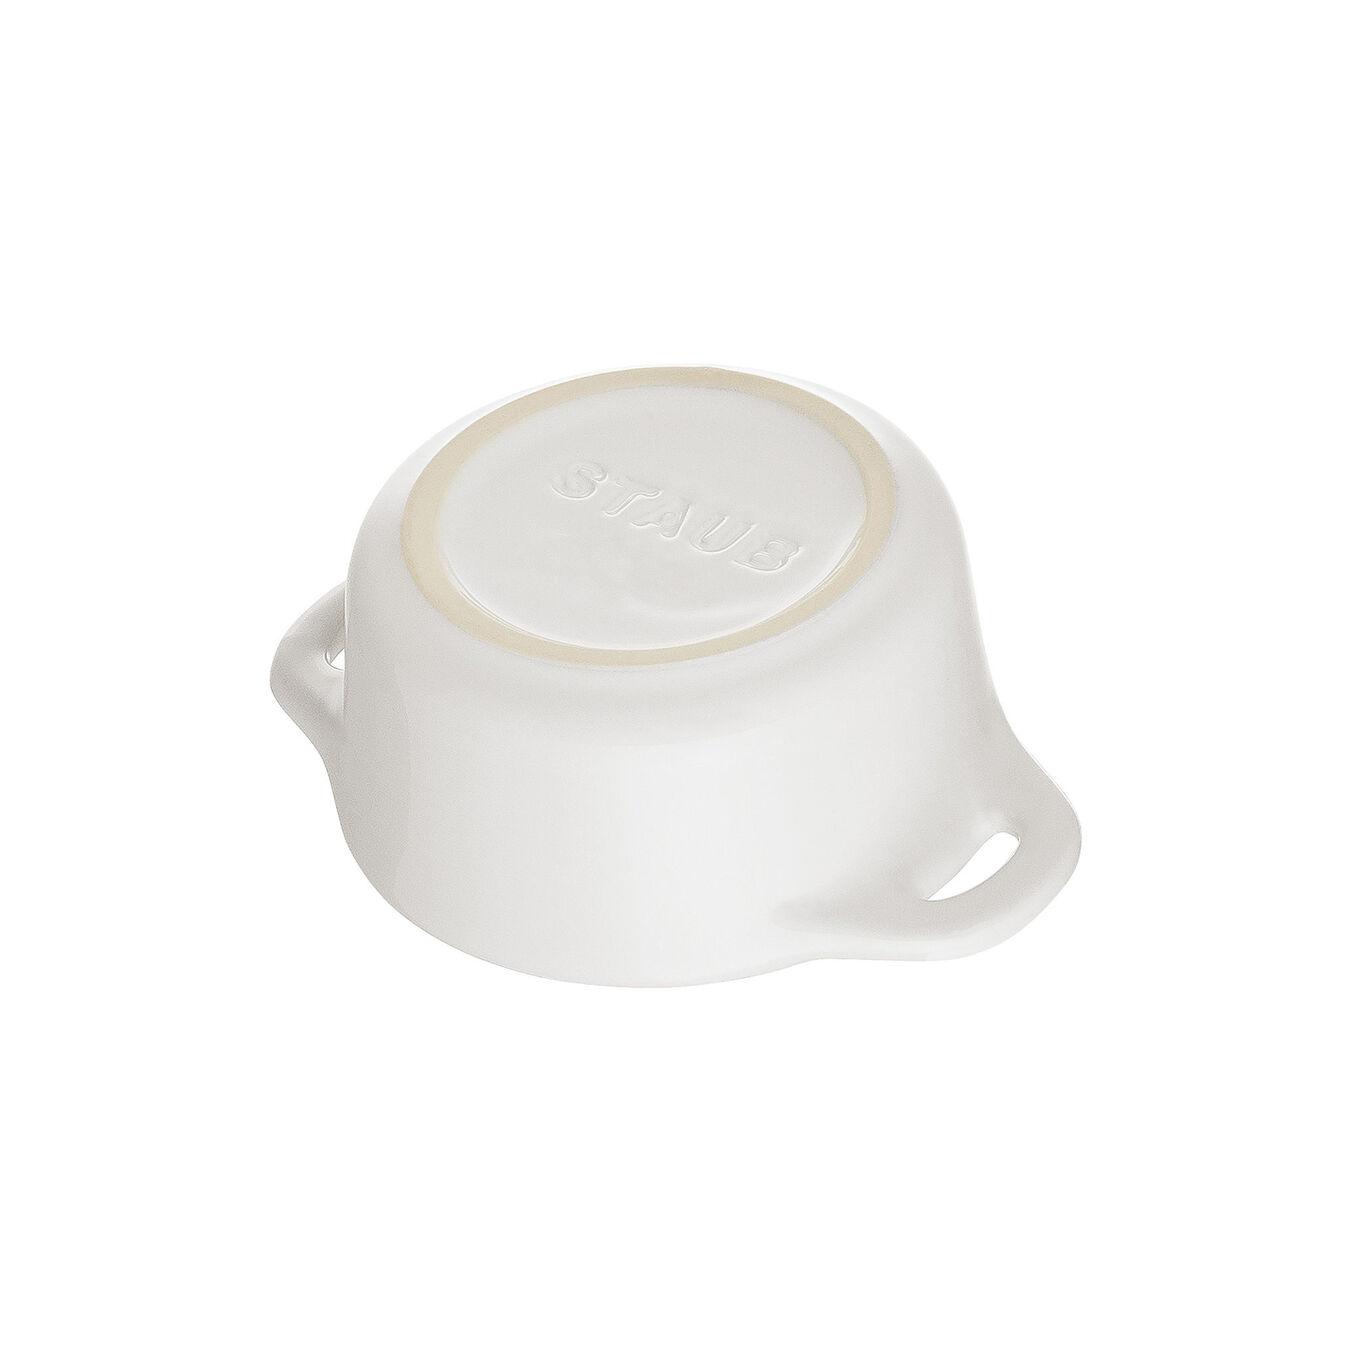 Mini Cocotte 10 cm, rund, Reinweiß, Keramik,,large 4